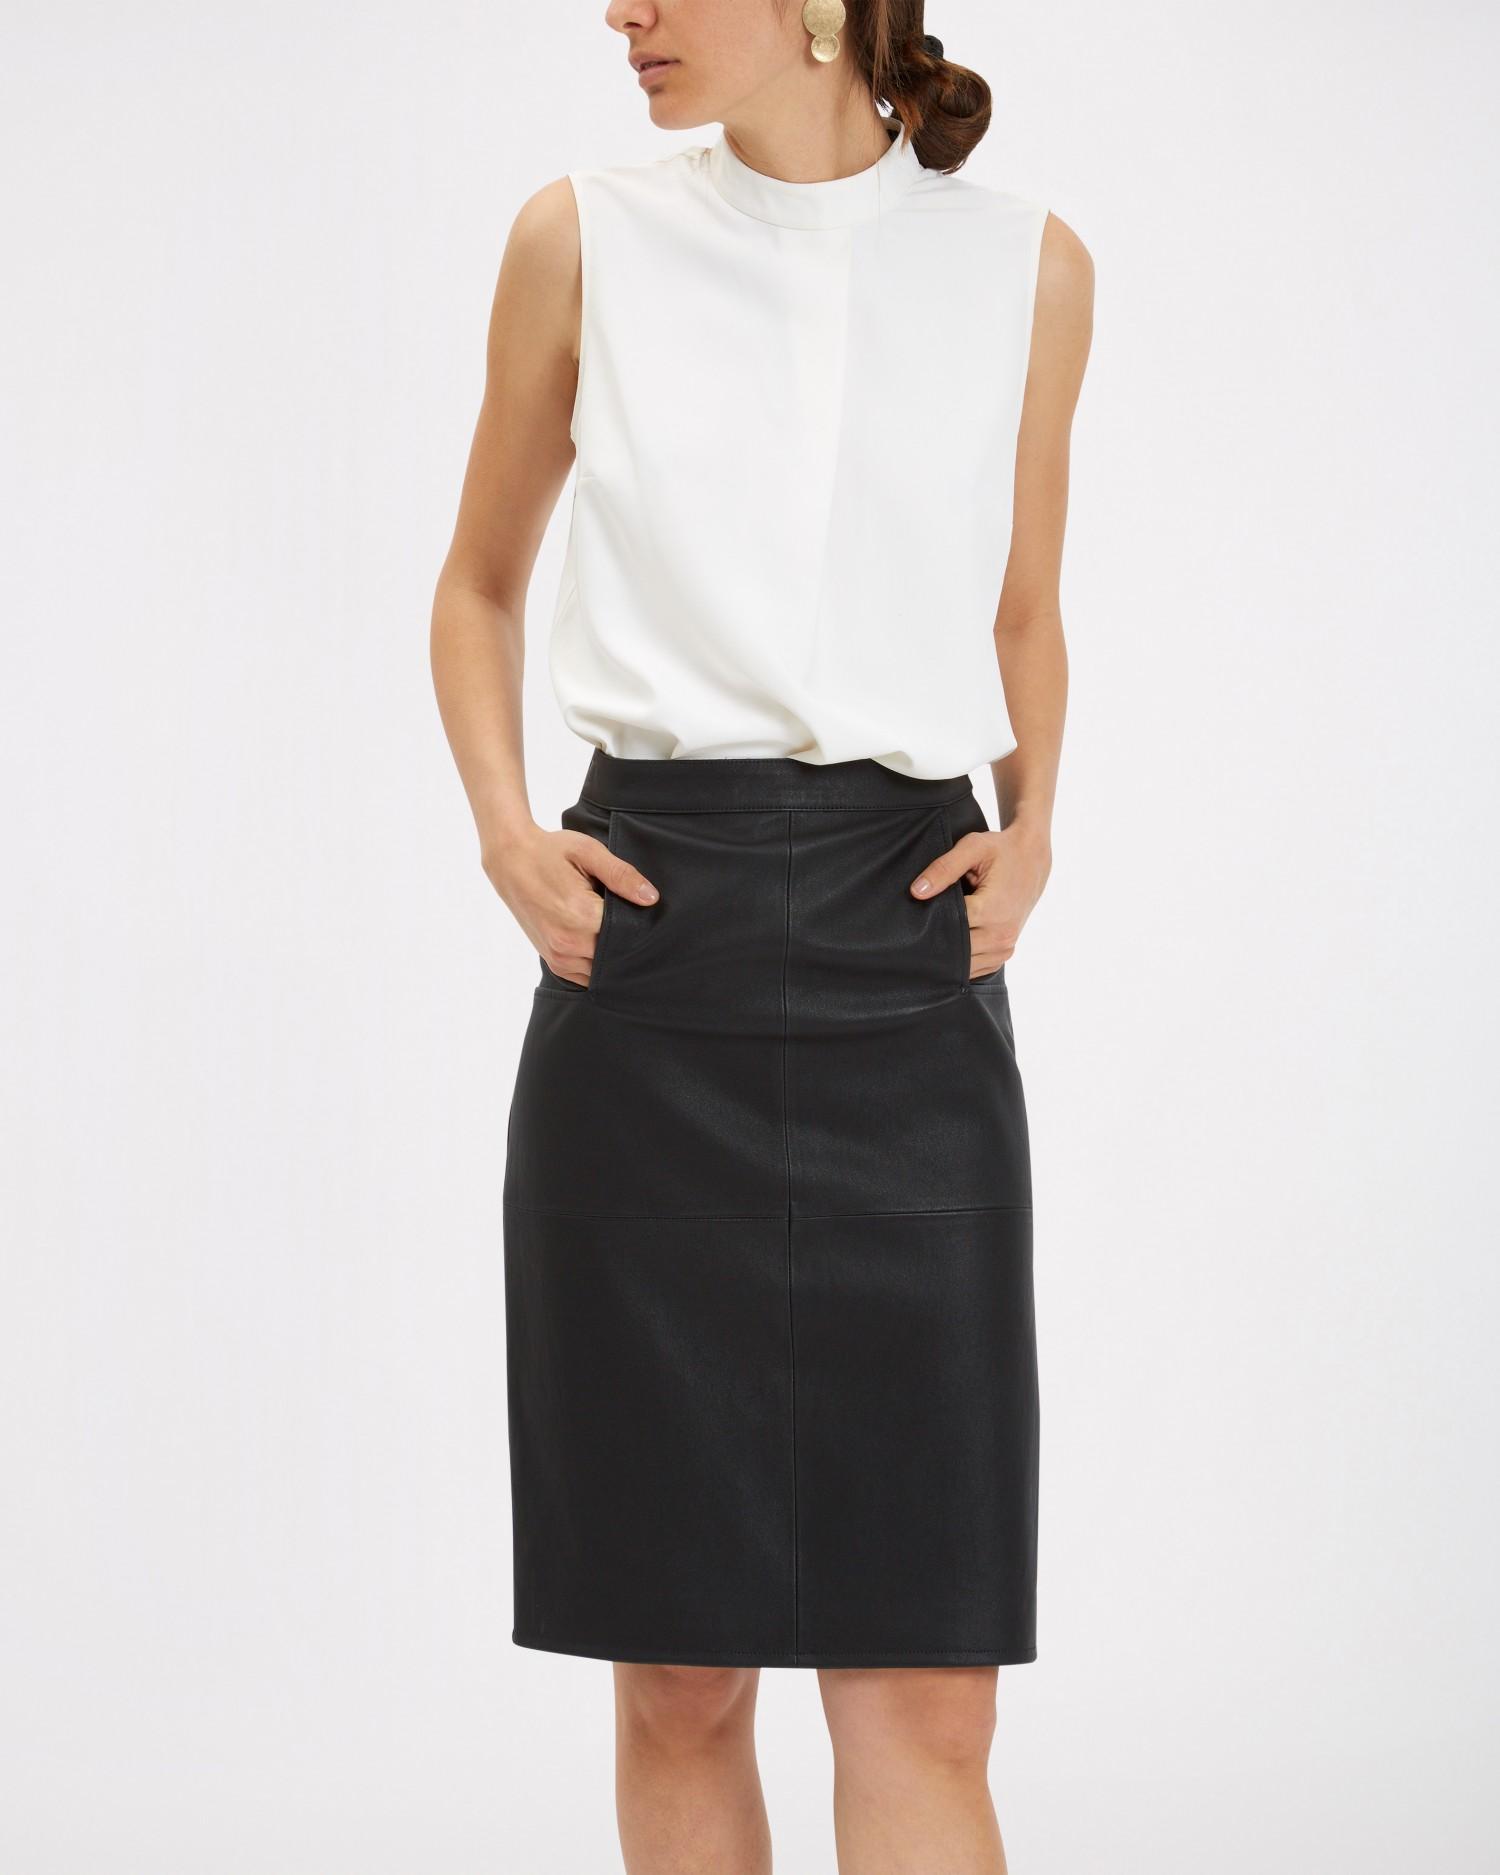 Jaeger black leather skirt